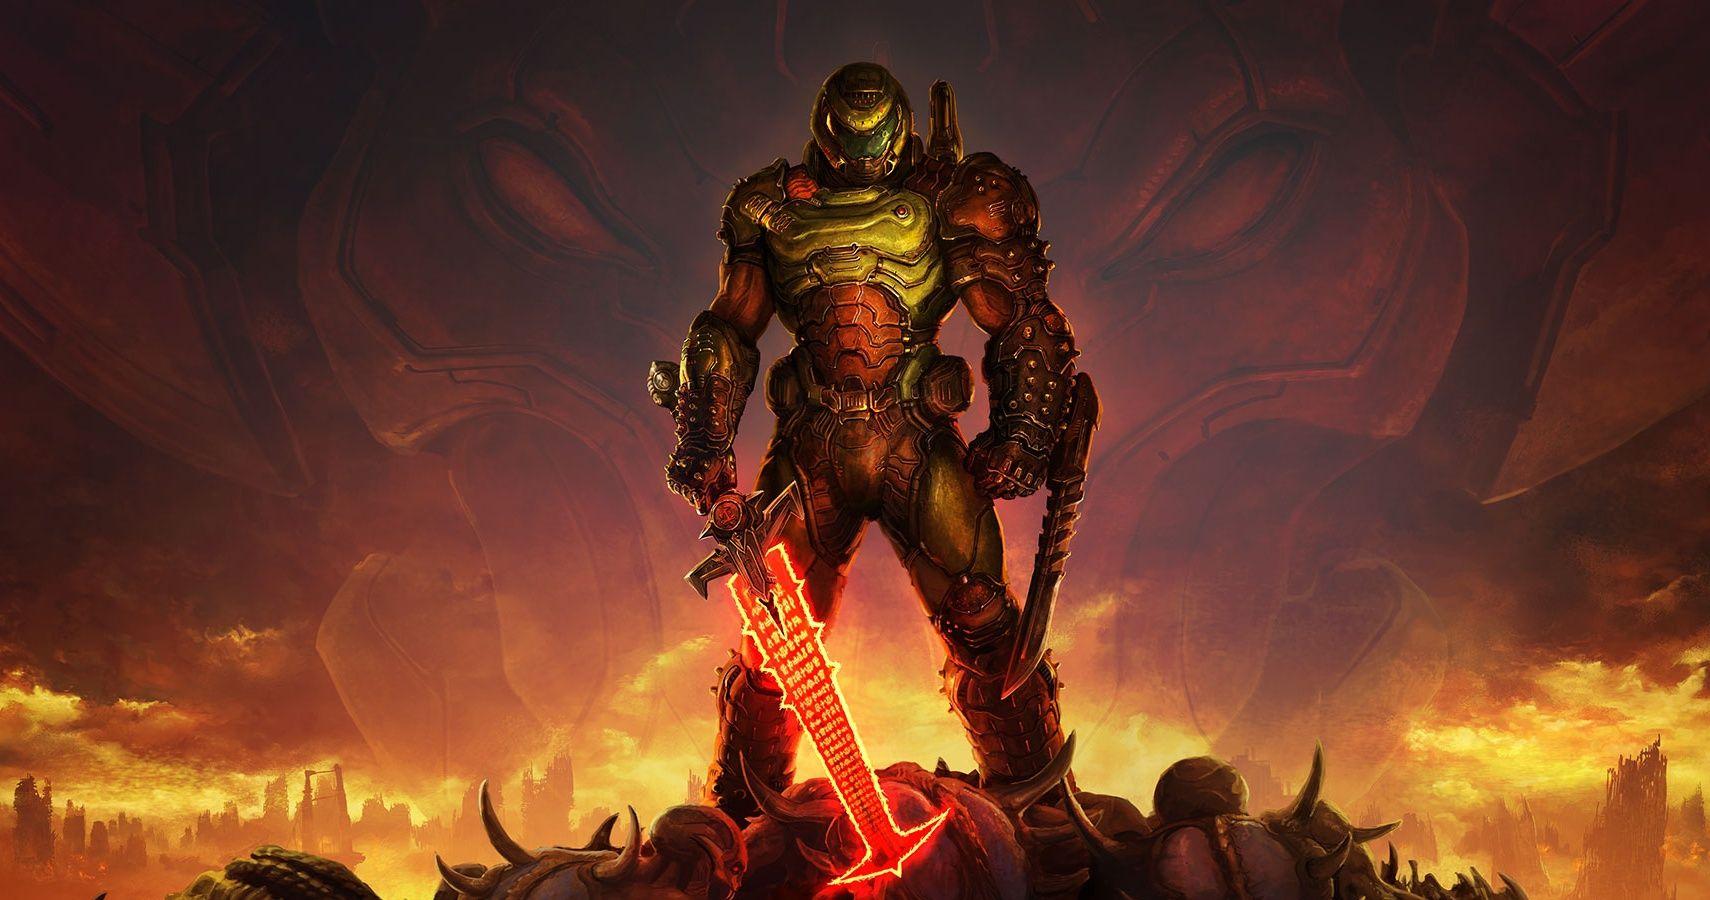 10 Tips To Make An Overpowered Doomslayer In Doom Eternal